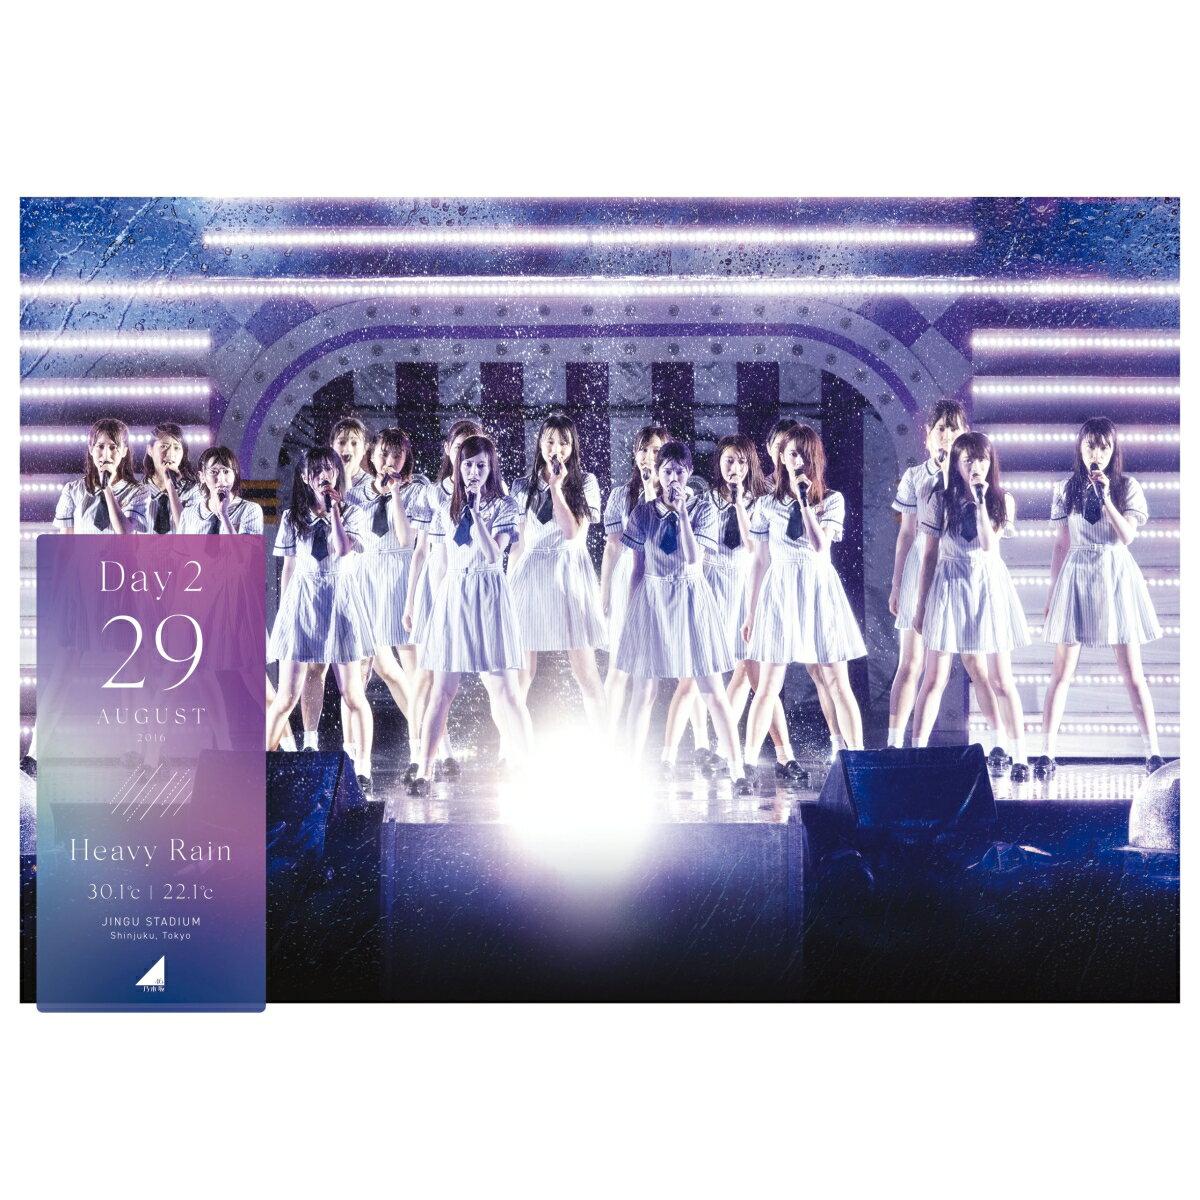 乃木坂46 4th YEAR BIRTHDAY LIVE 2016.8.28-30 JINGU STADIUM Day2 [ 乃木坂46 ]